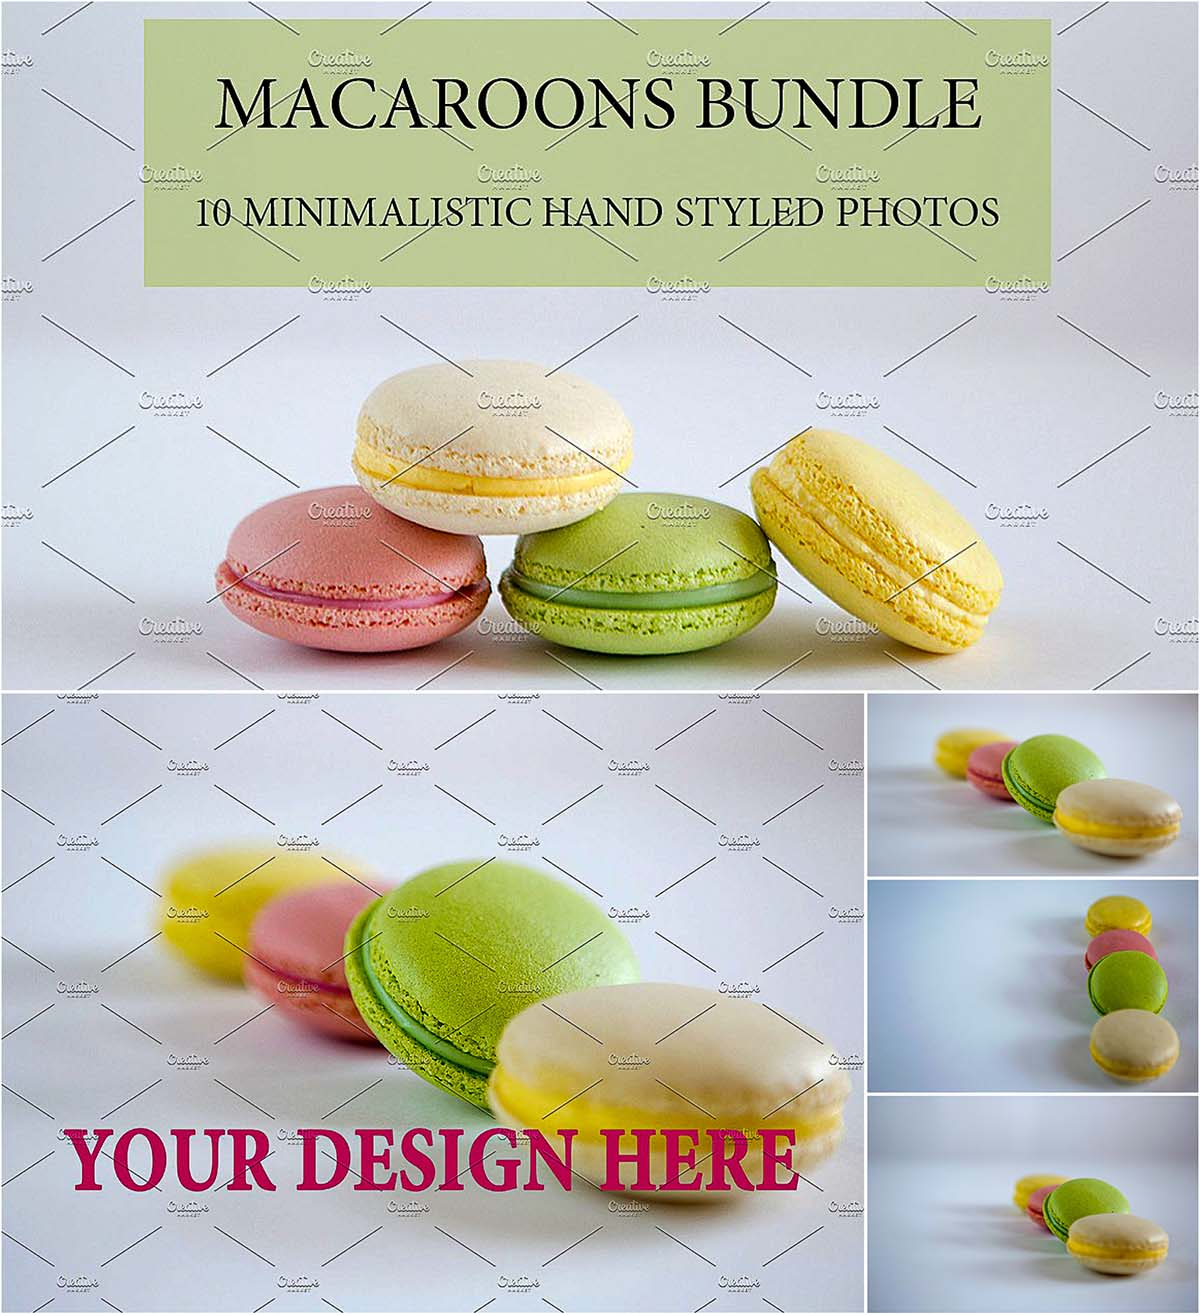 Macaroons styled photo